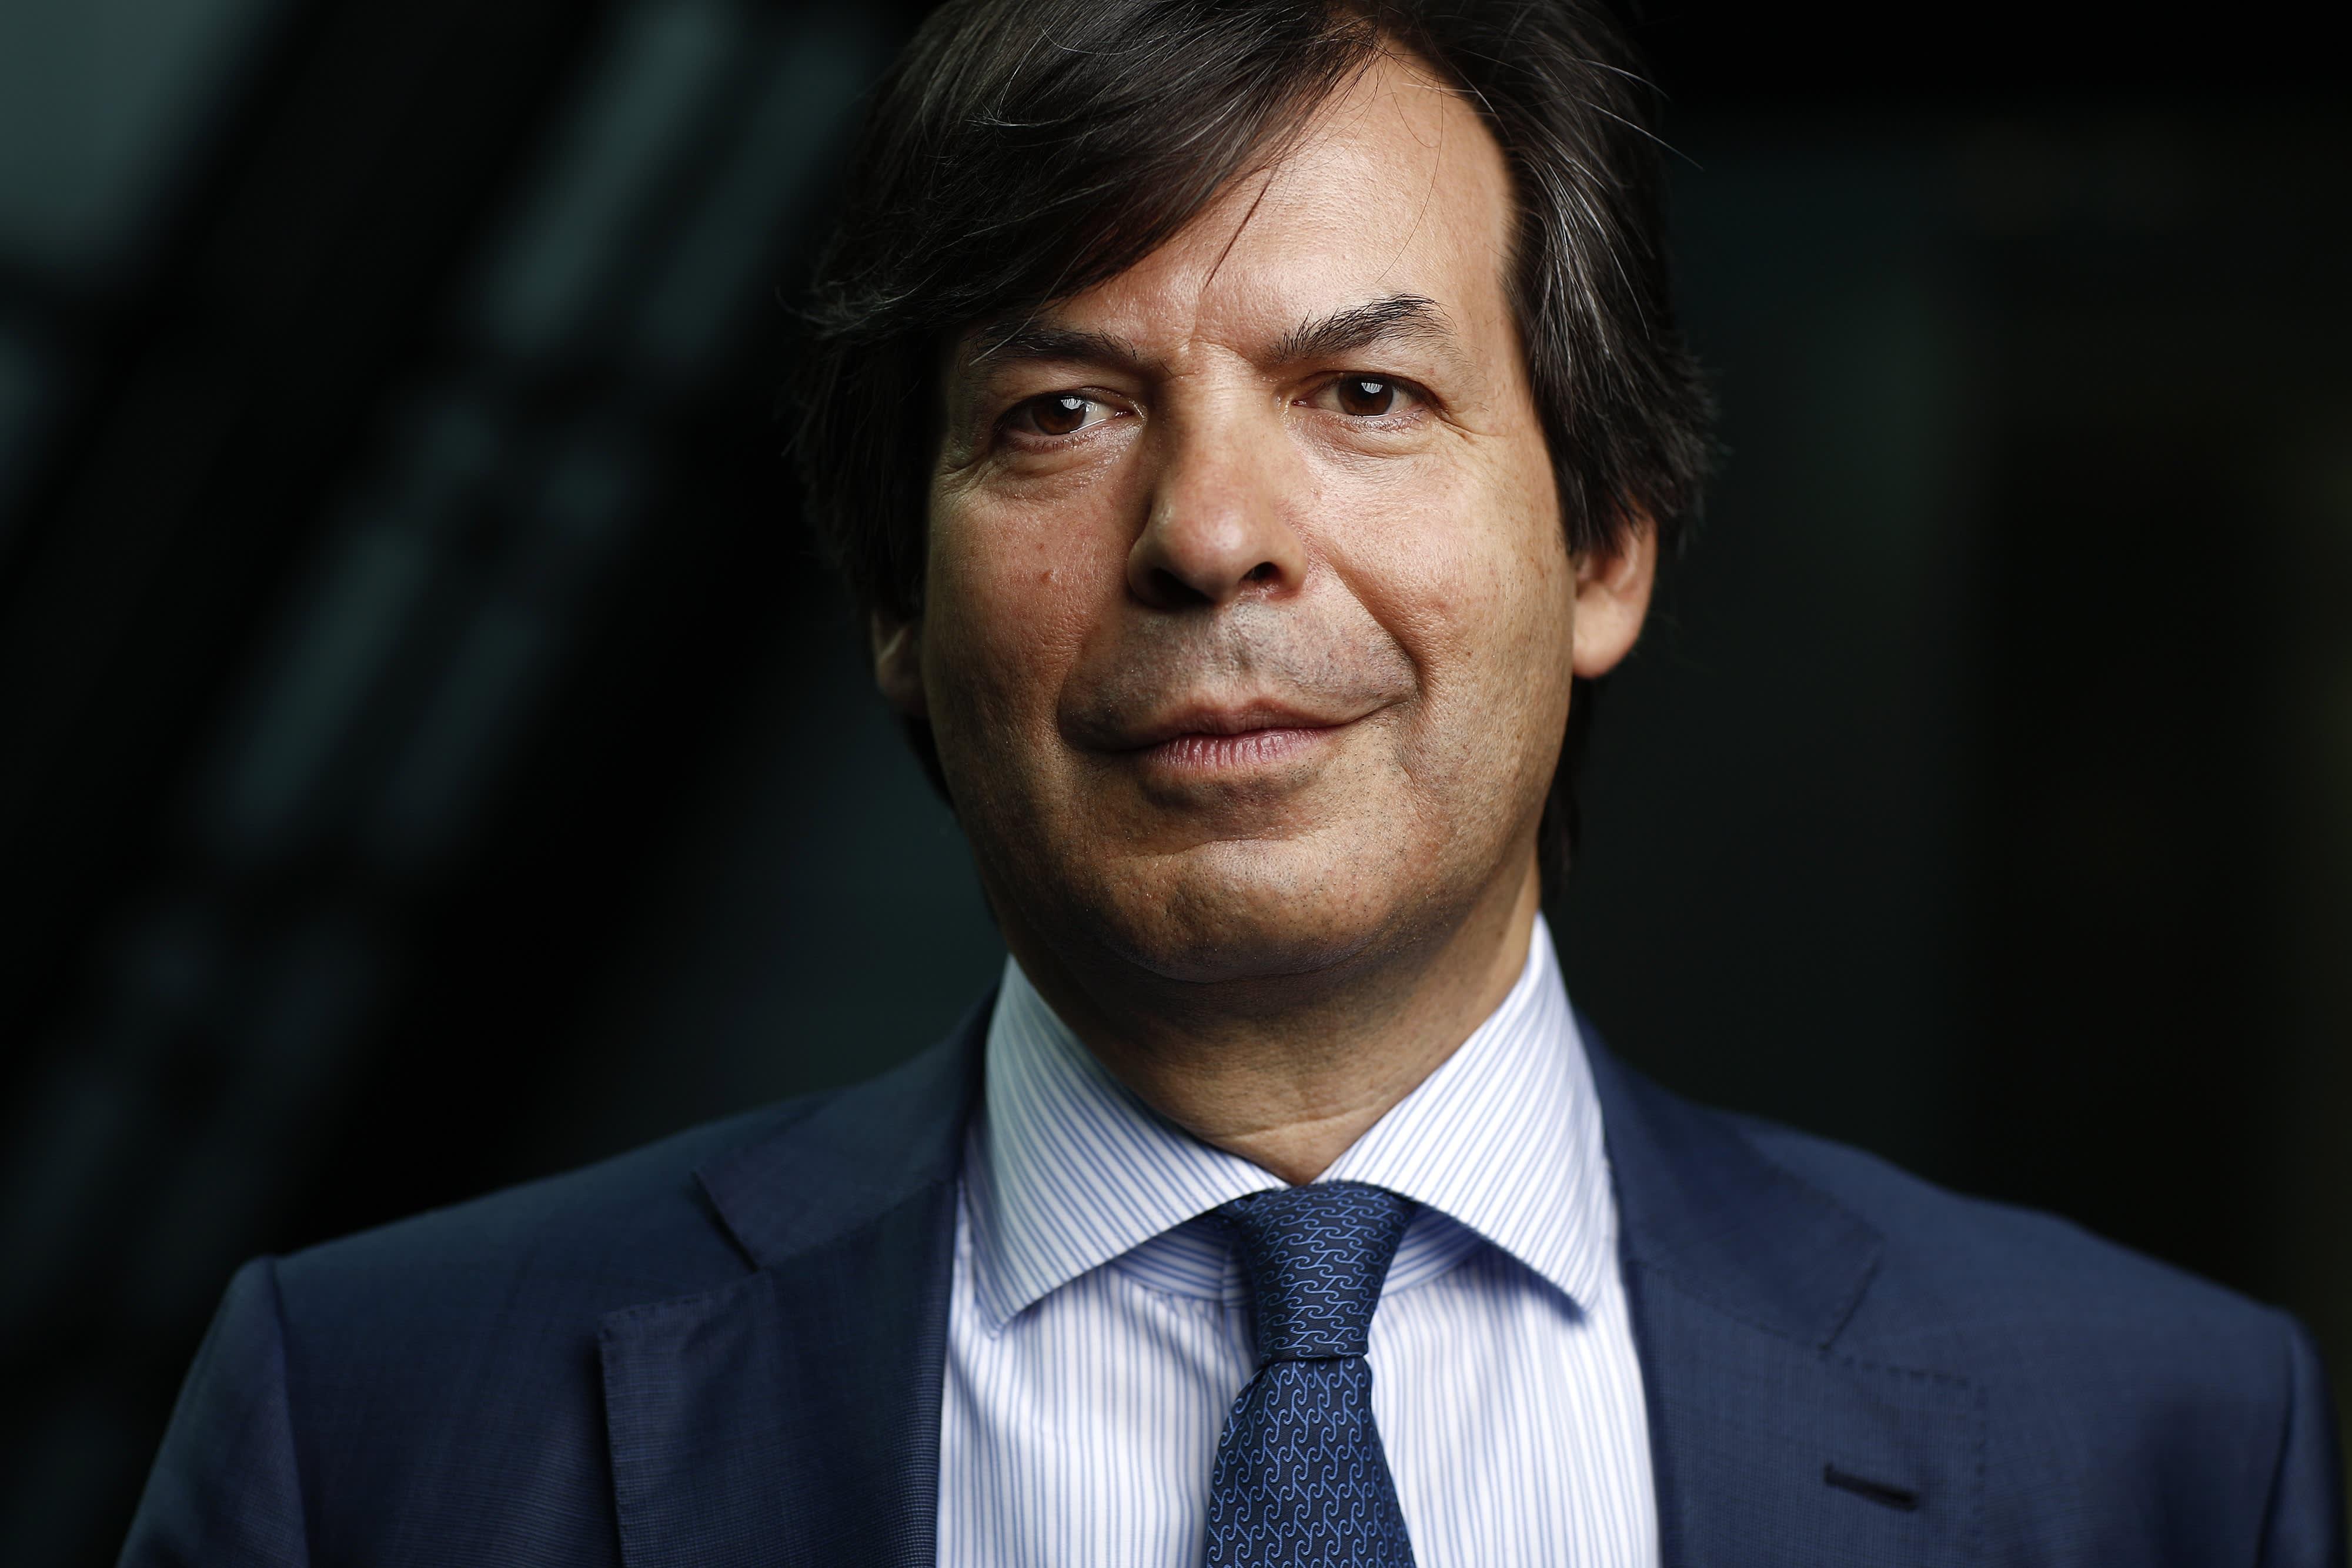 Italian banking gloom is 'exaggerated,' Intesa Sanpaolo CEO says